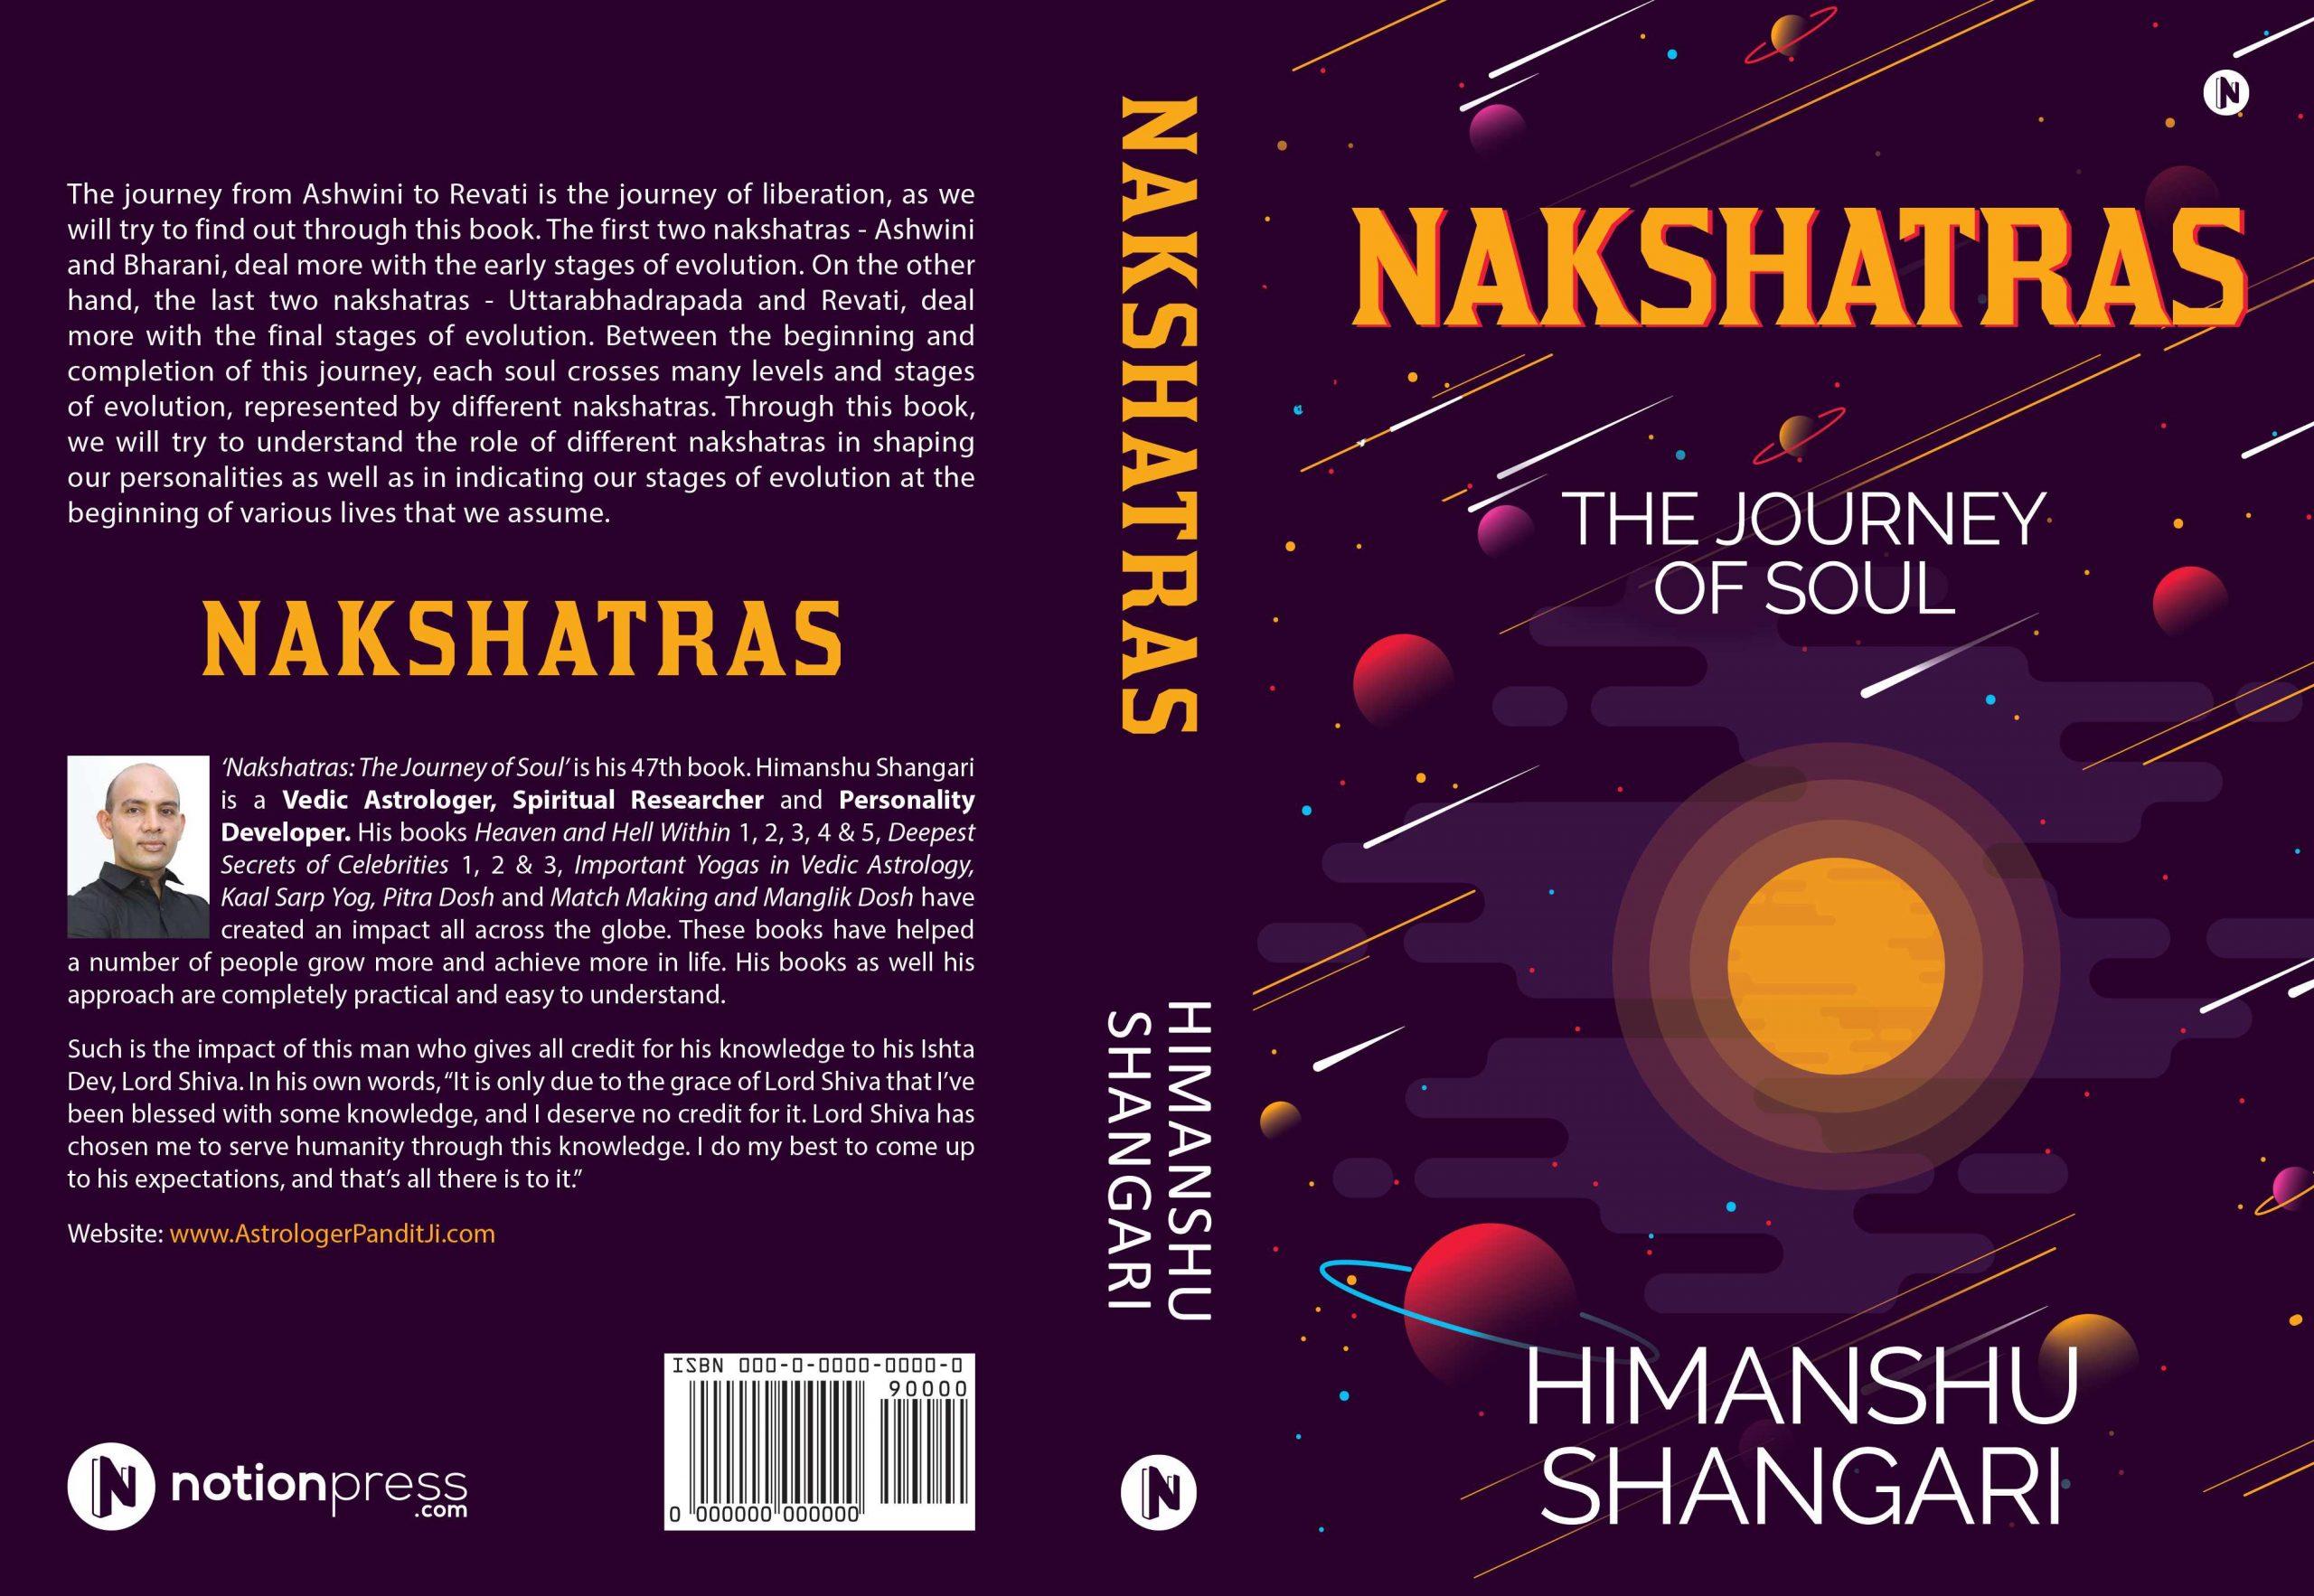 Nakshatras - The Journey of Soul